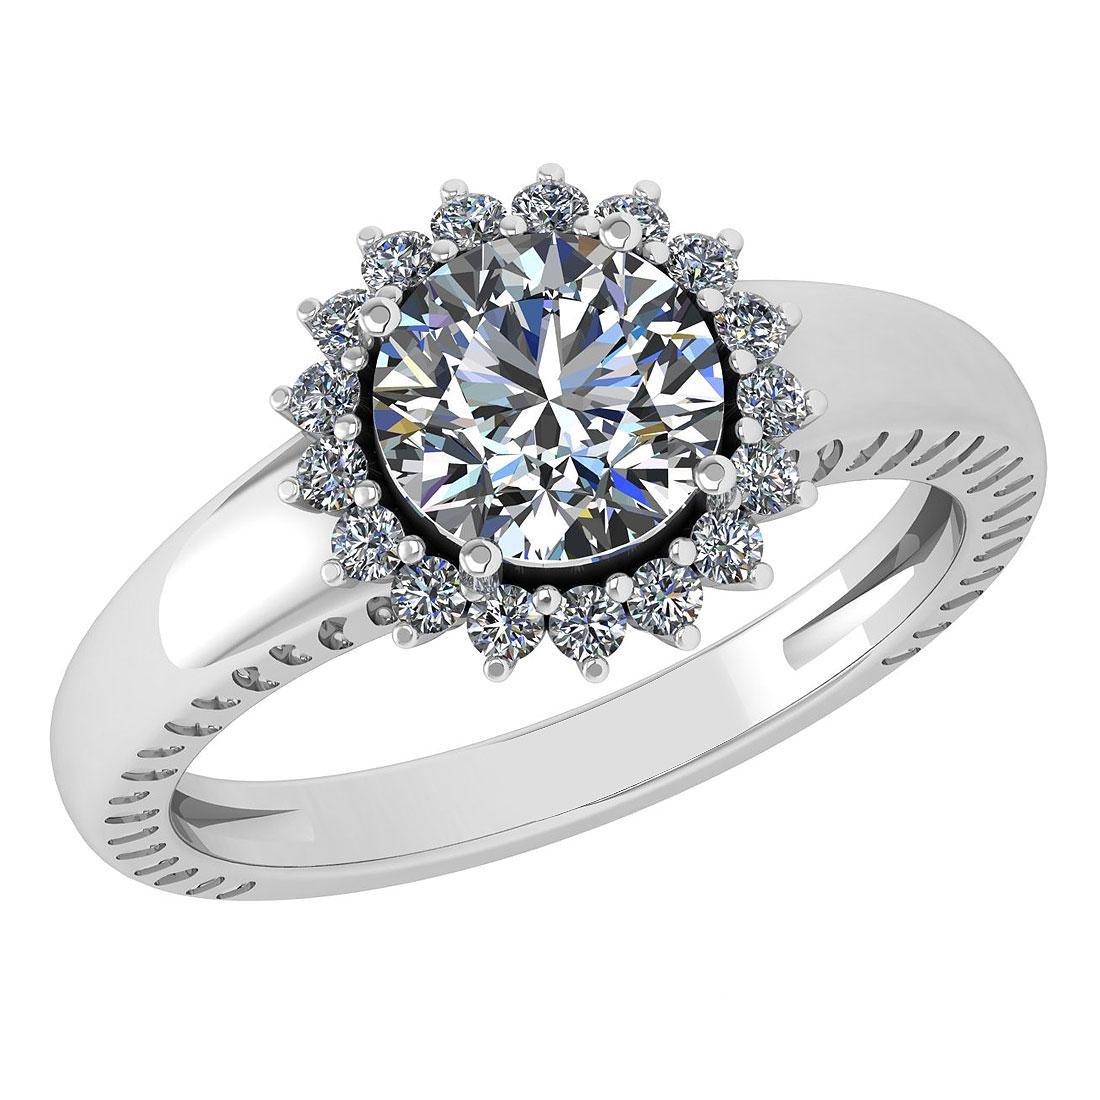 Certified 1.48 Ctw Diamond Wedding/Engagement Style 14K